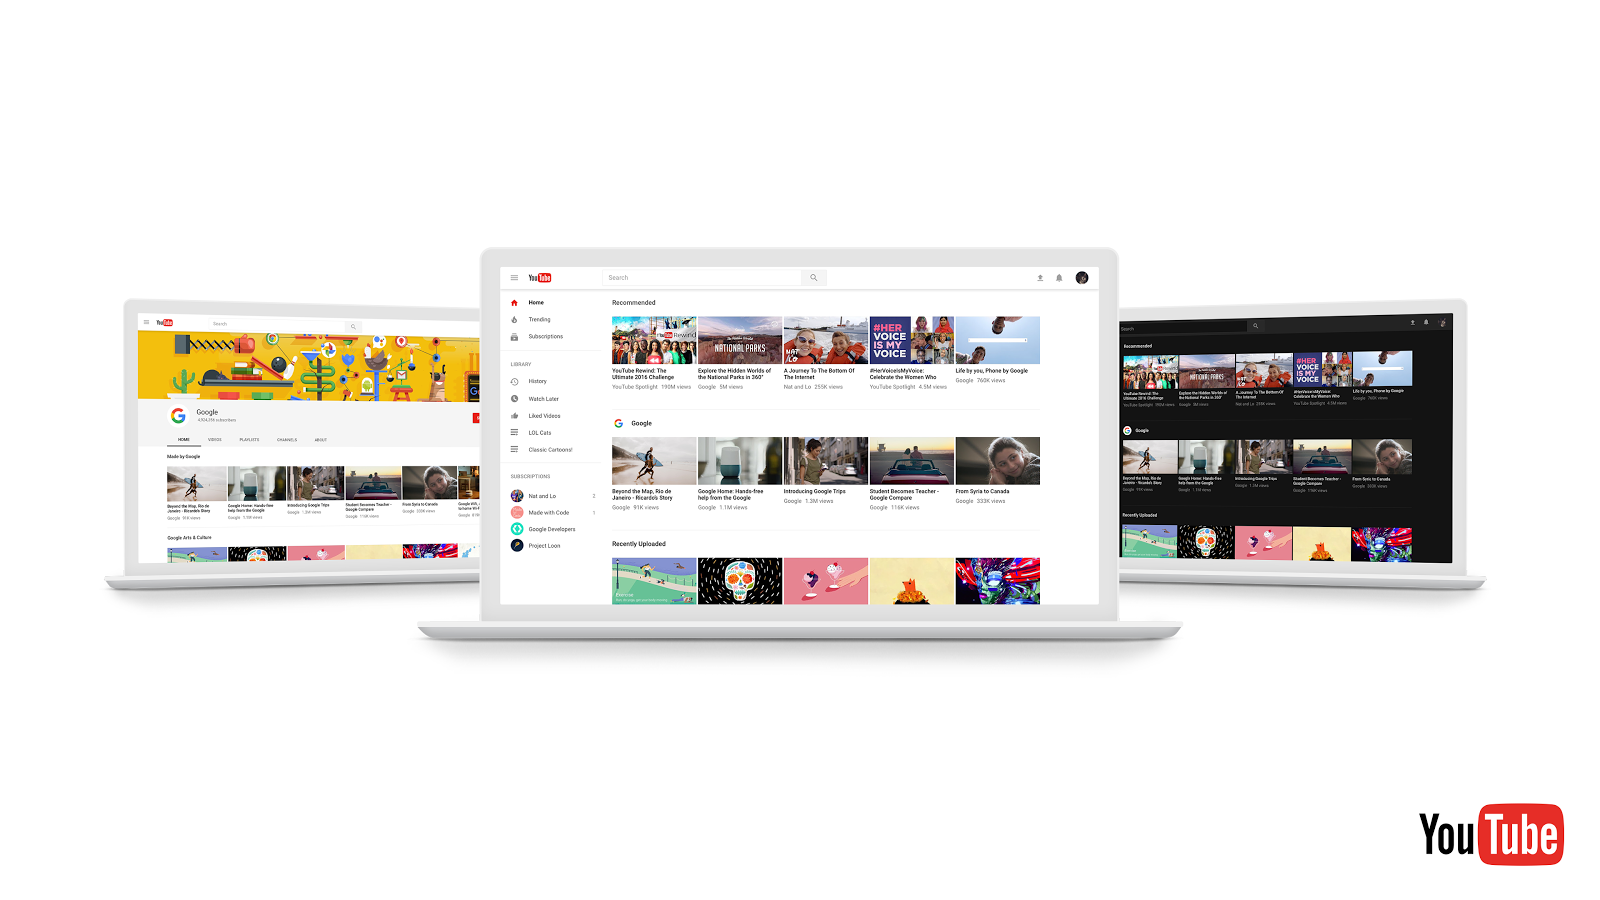 YouTube Announces App Redesign, New Logo   Social Media Today